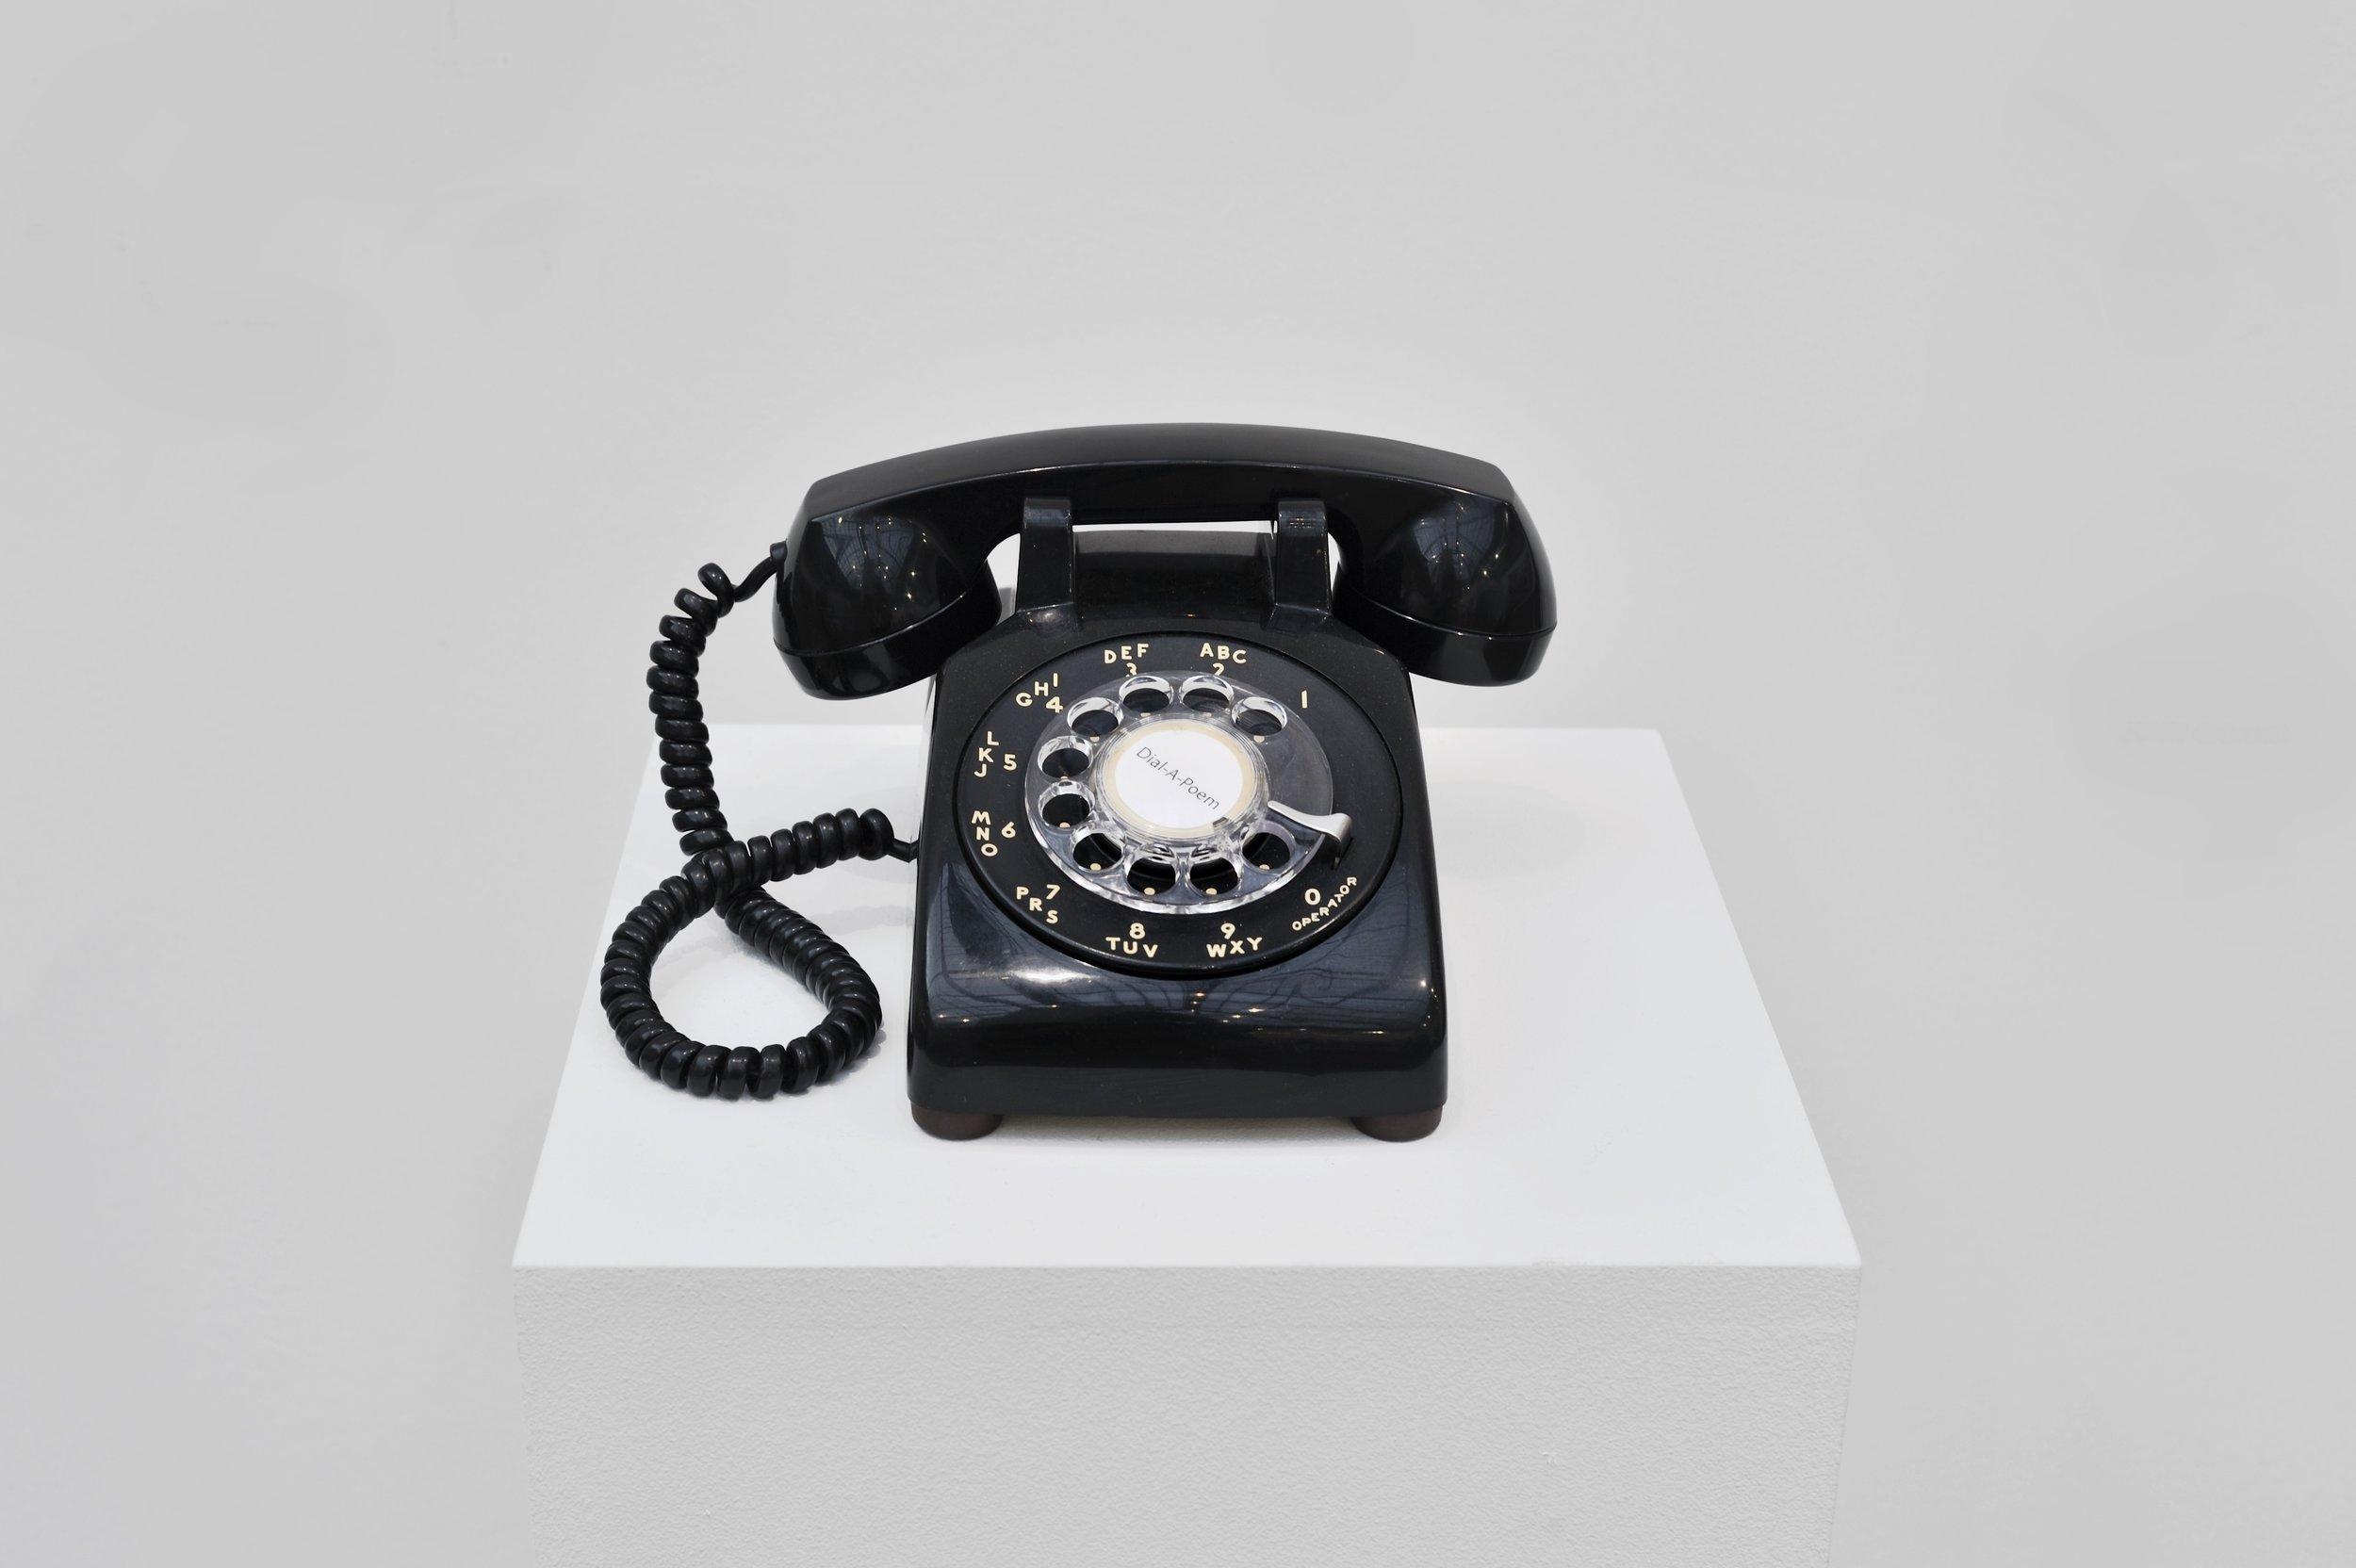 UGO RONDINONE: I LOVE JOHN GIORNO Installation view of Dial-A-Poem at Galerie Almine Rech, 2012 © John Giorno, Courtesy of John Giorno Collection